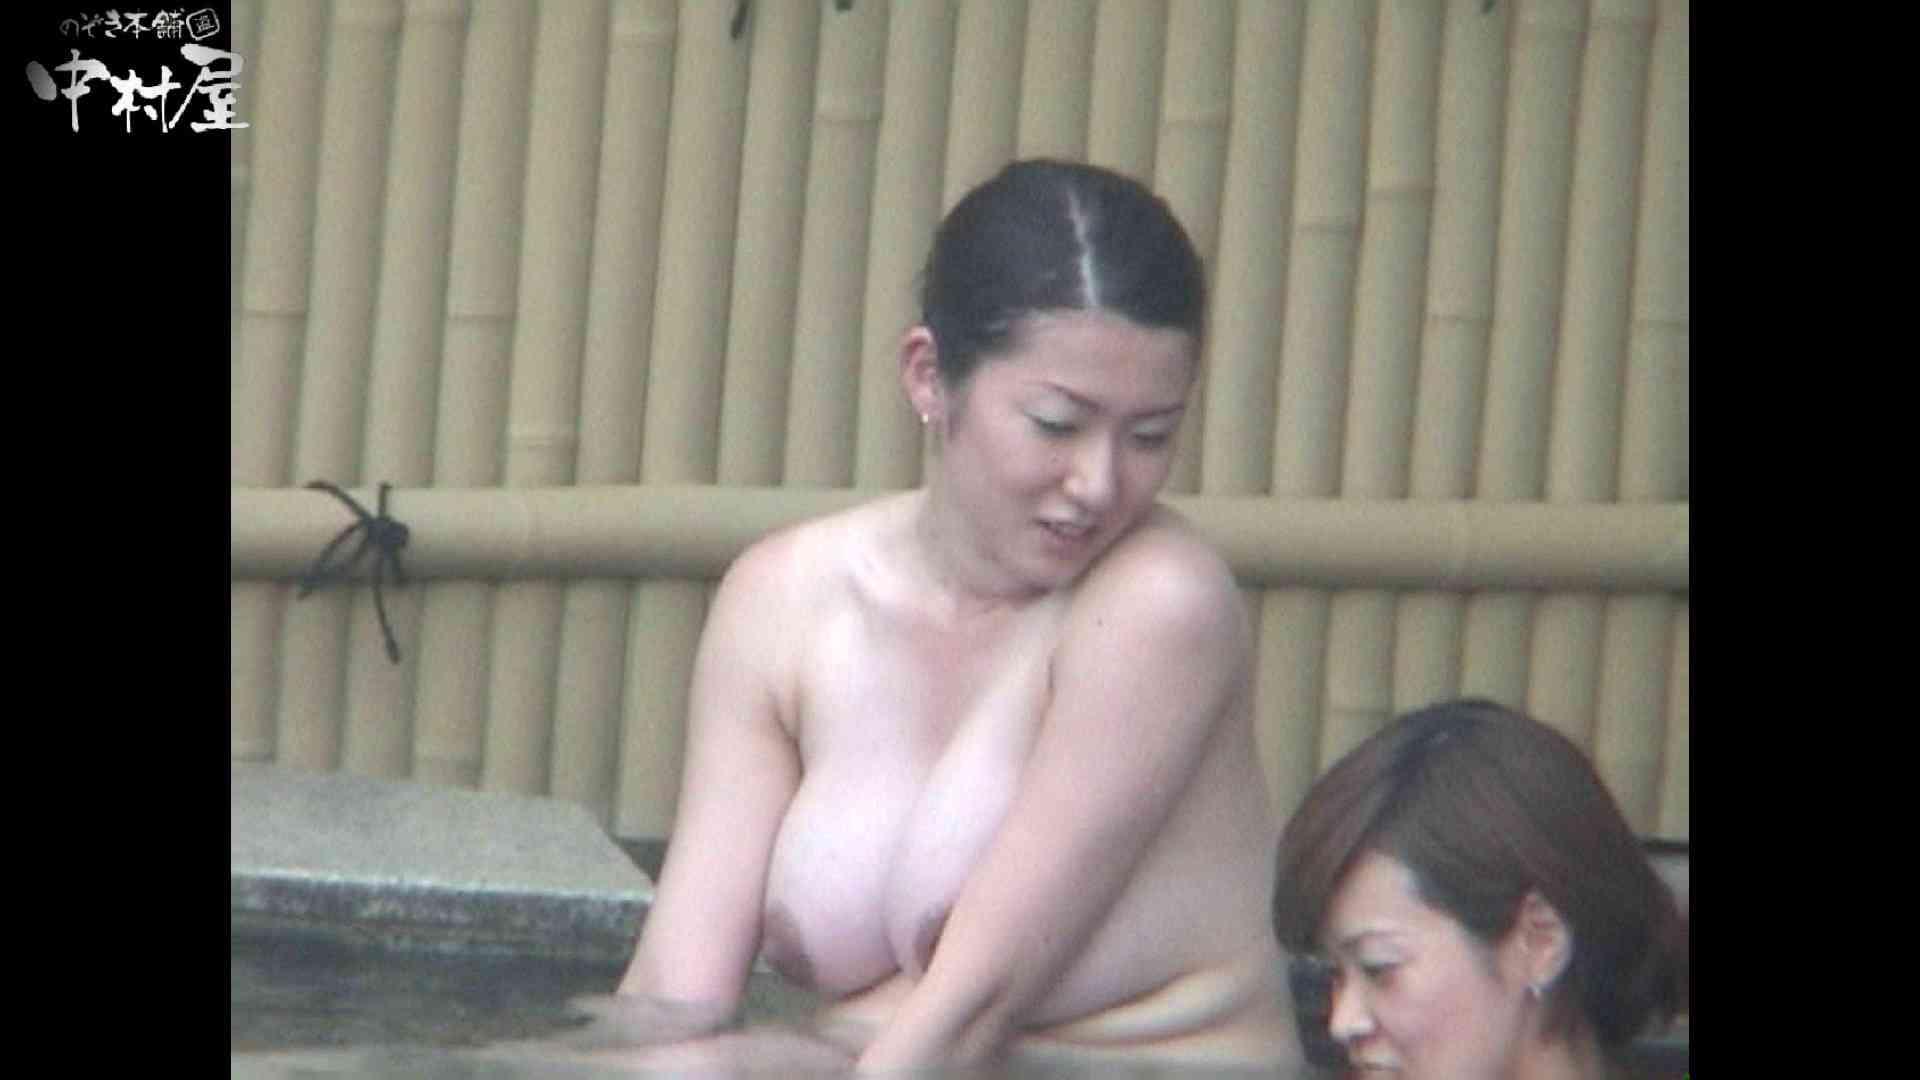 Aquaな露天風呂Vol.961 露天風呂 | OLのエロ生活  104連発 100